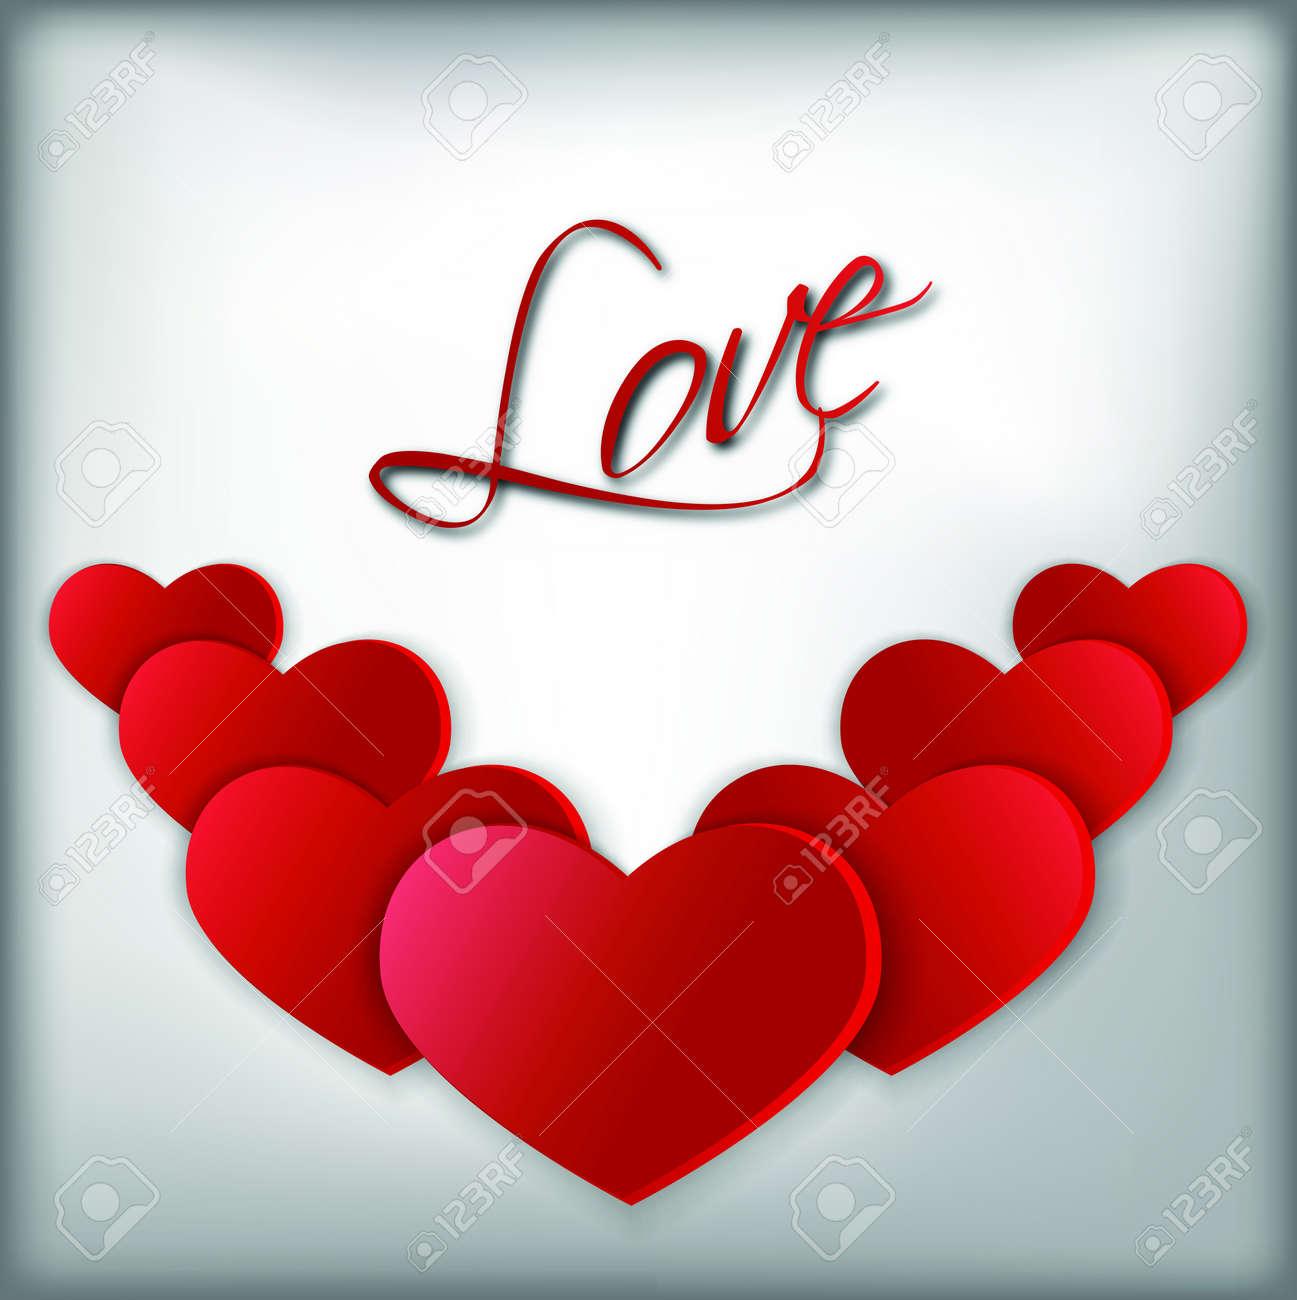 Big red hearts symbols of st valentine royalty free cliparts big red hearts symbols of st valentine stock vector 35378442 biocorpaavc